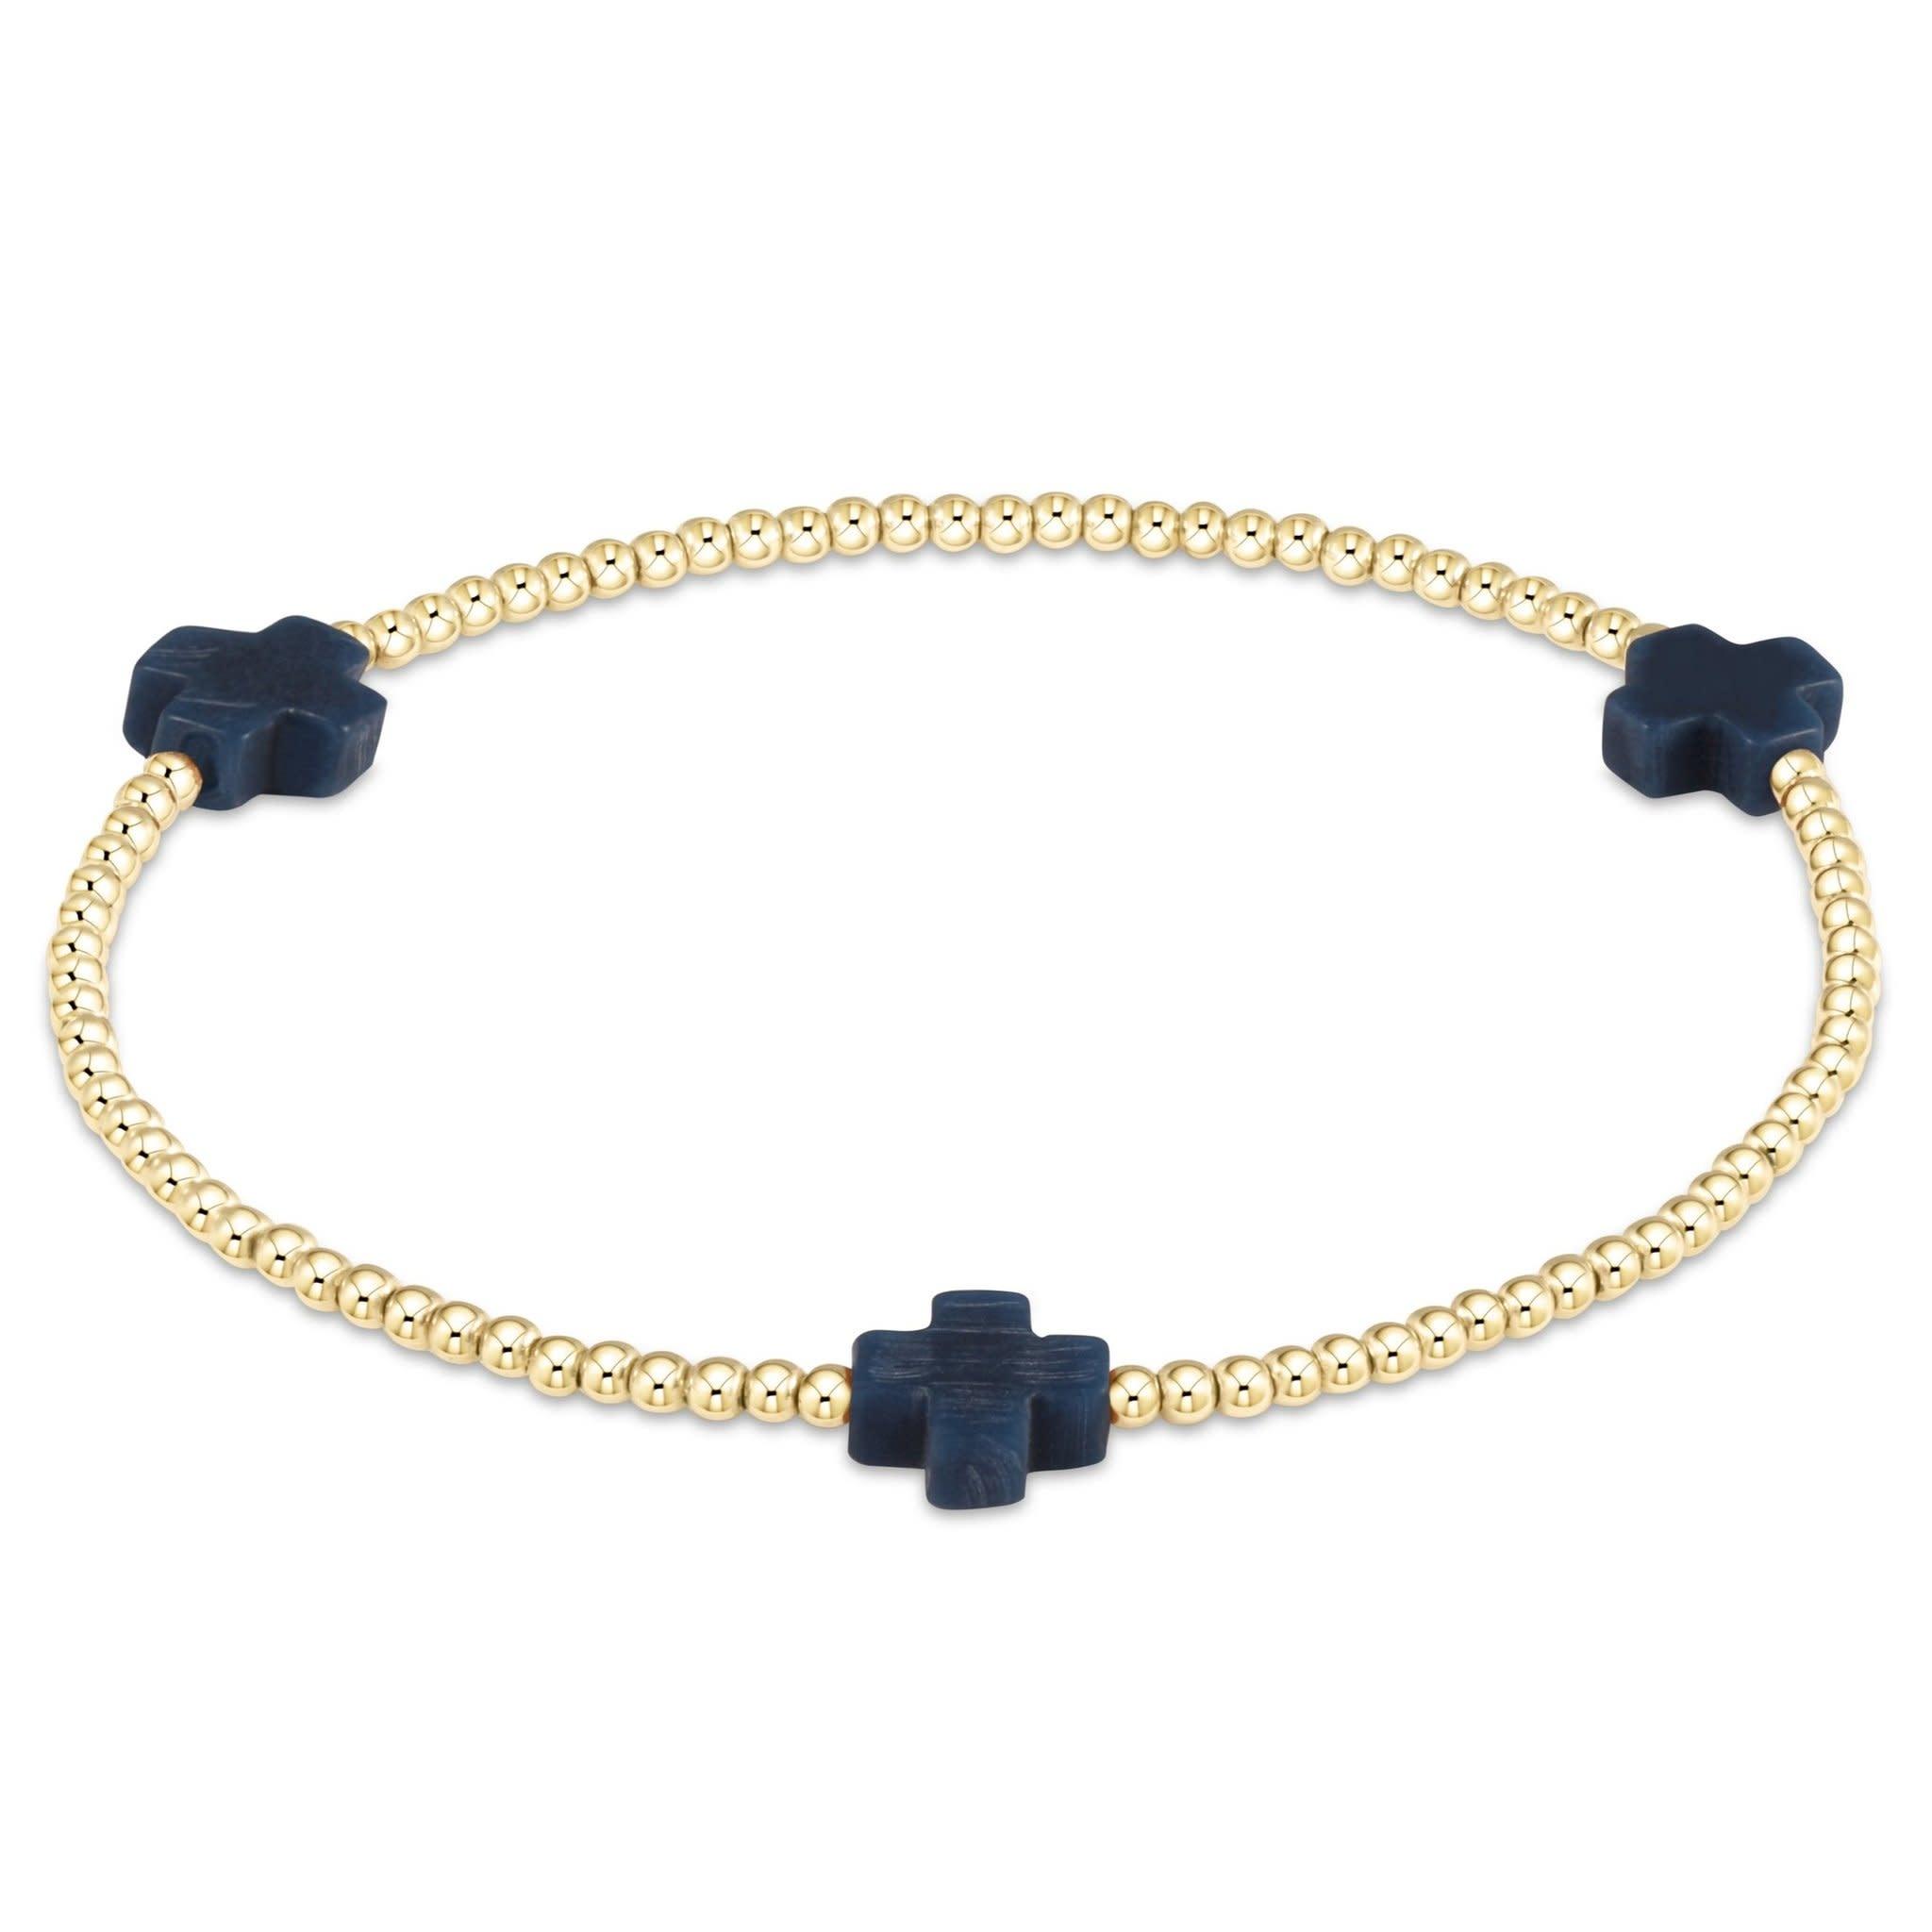 Extends Cross 3mm Navy Bracelet